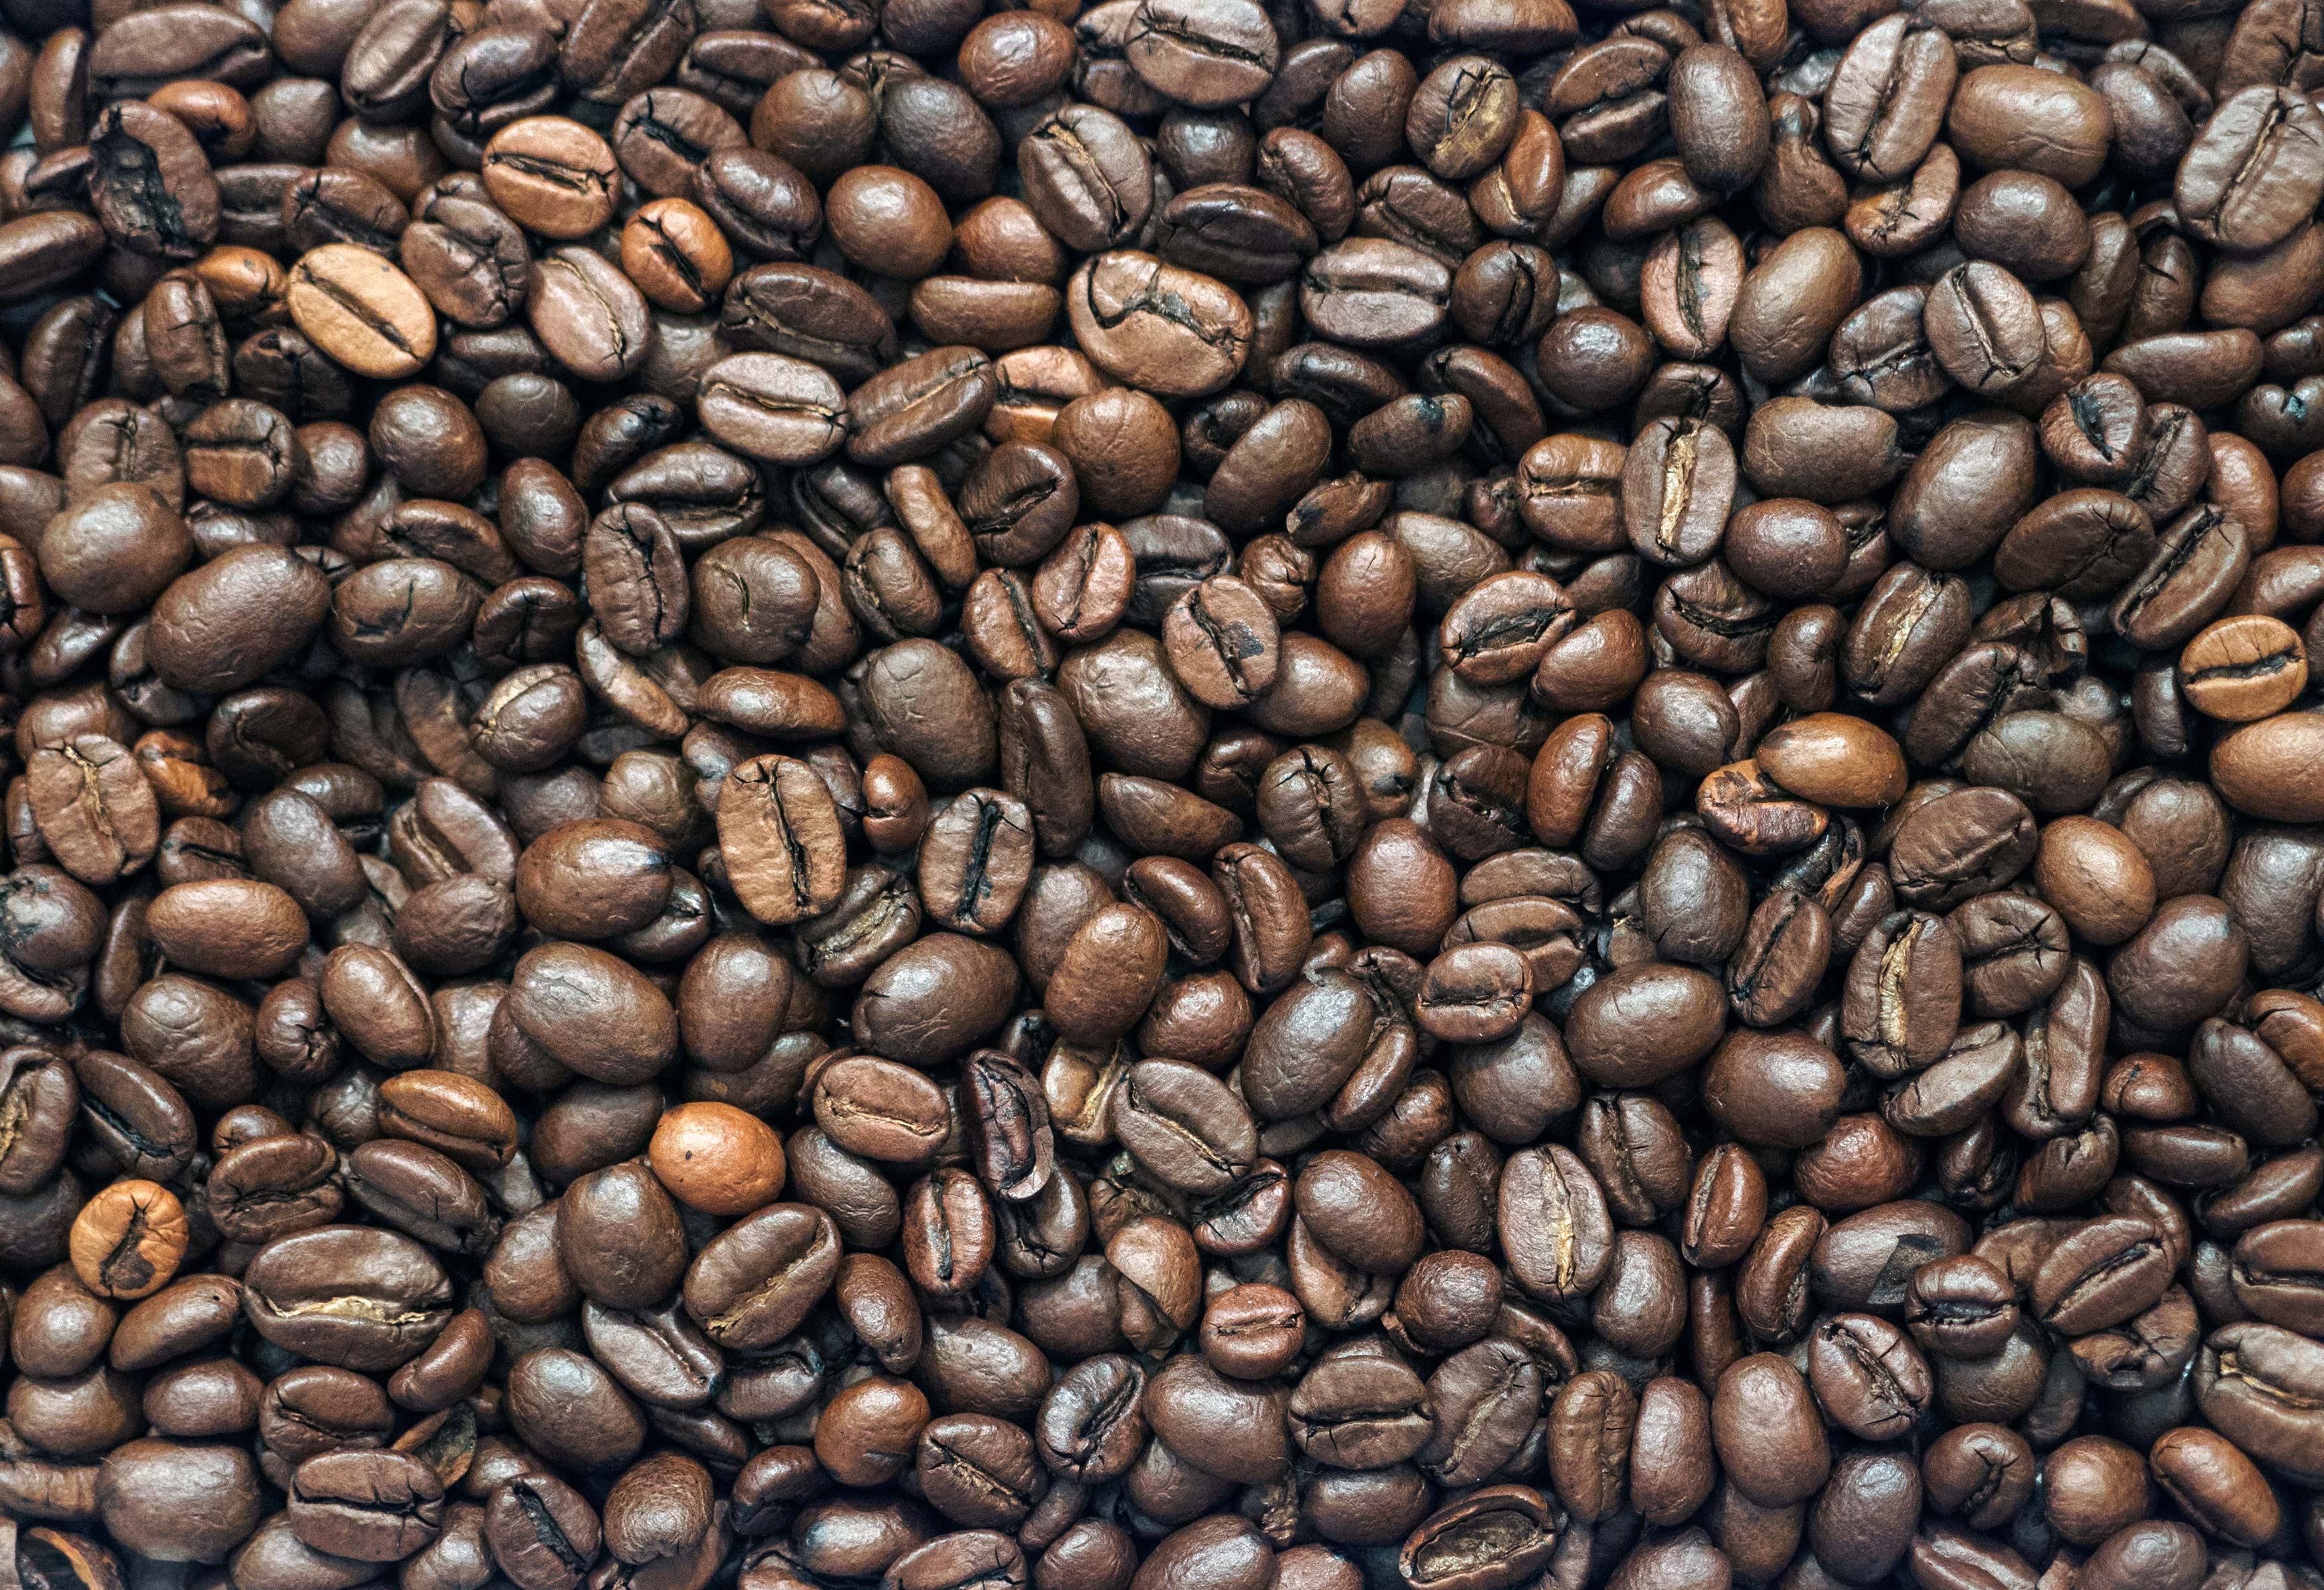 Free Image: Coffee Beans | Libreshot Public Domain Photos